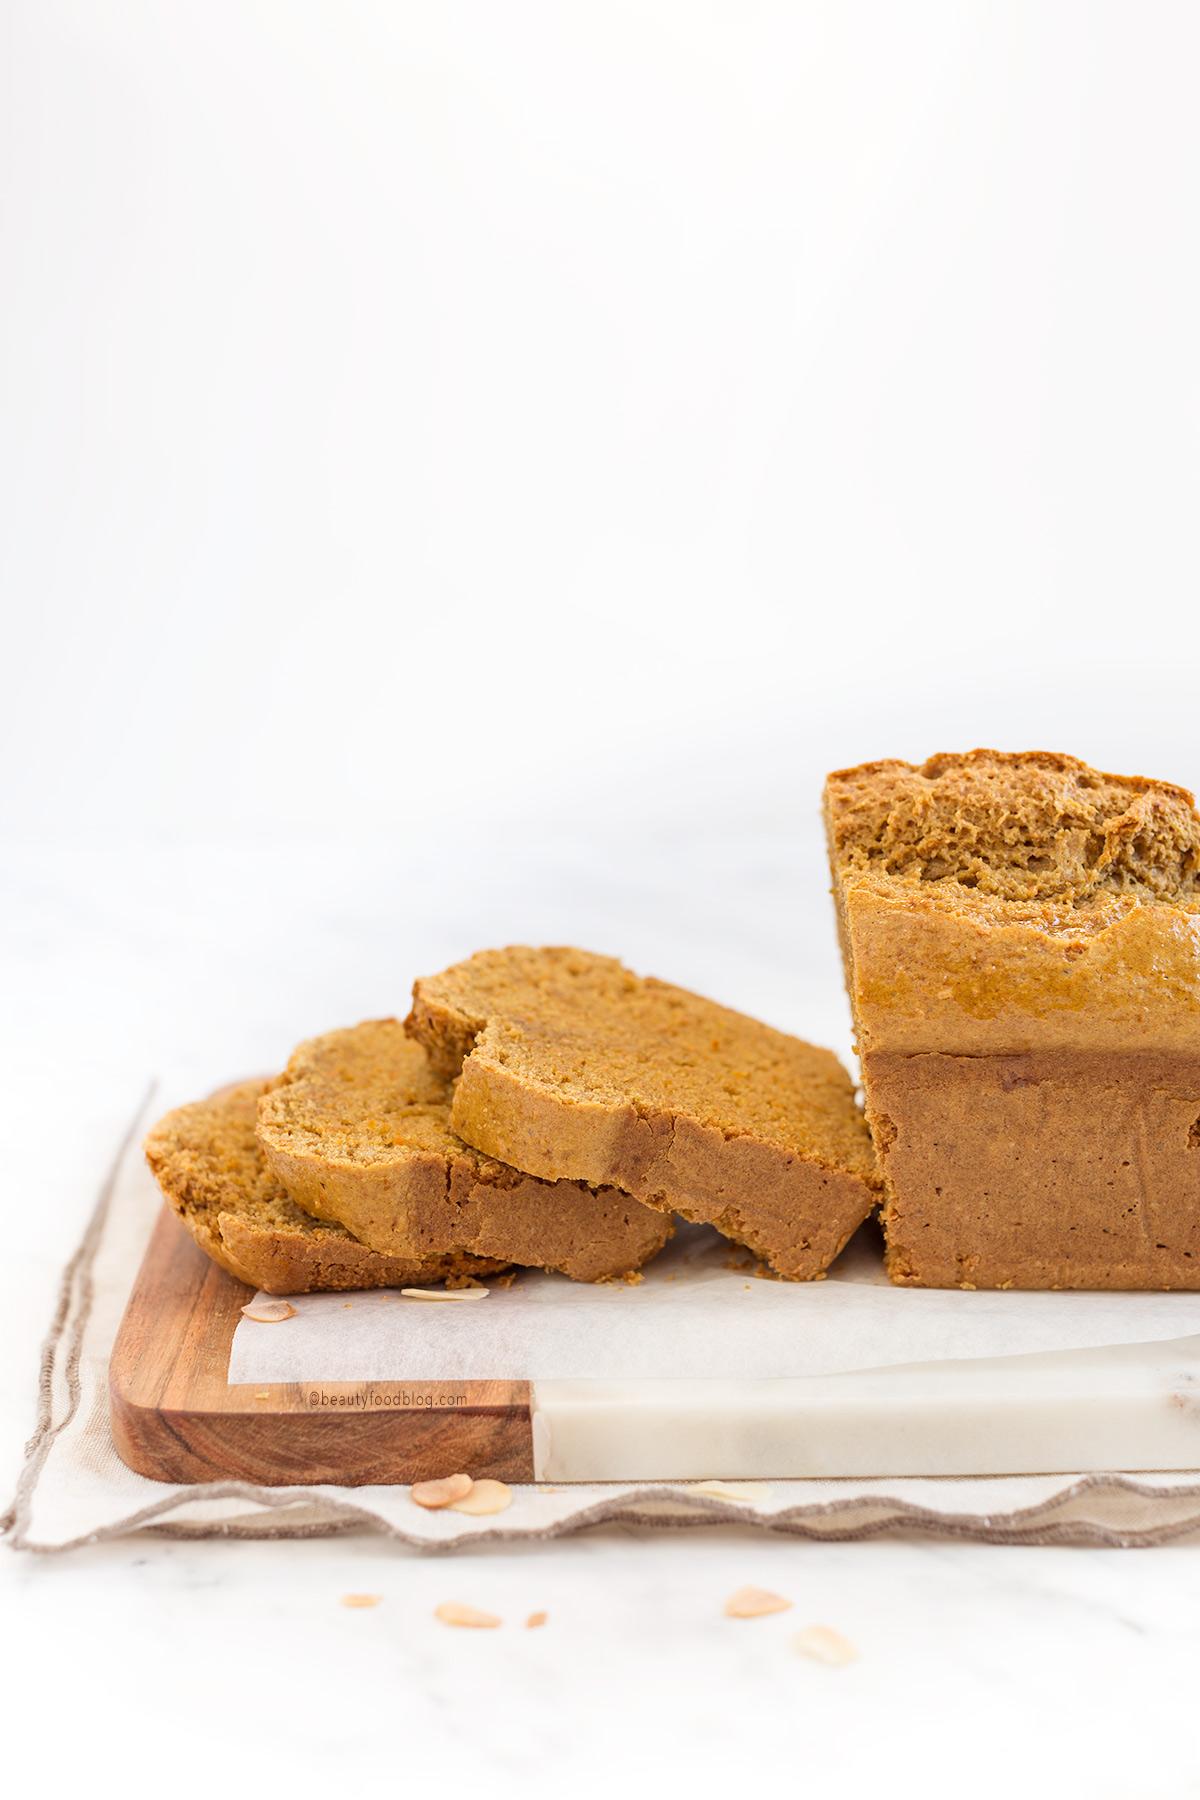 wholemeal spelt #vegan #carrot almond loaf cake - plumcake vegan alle carote e mandorle di farro integrale